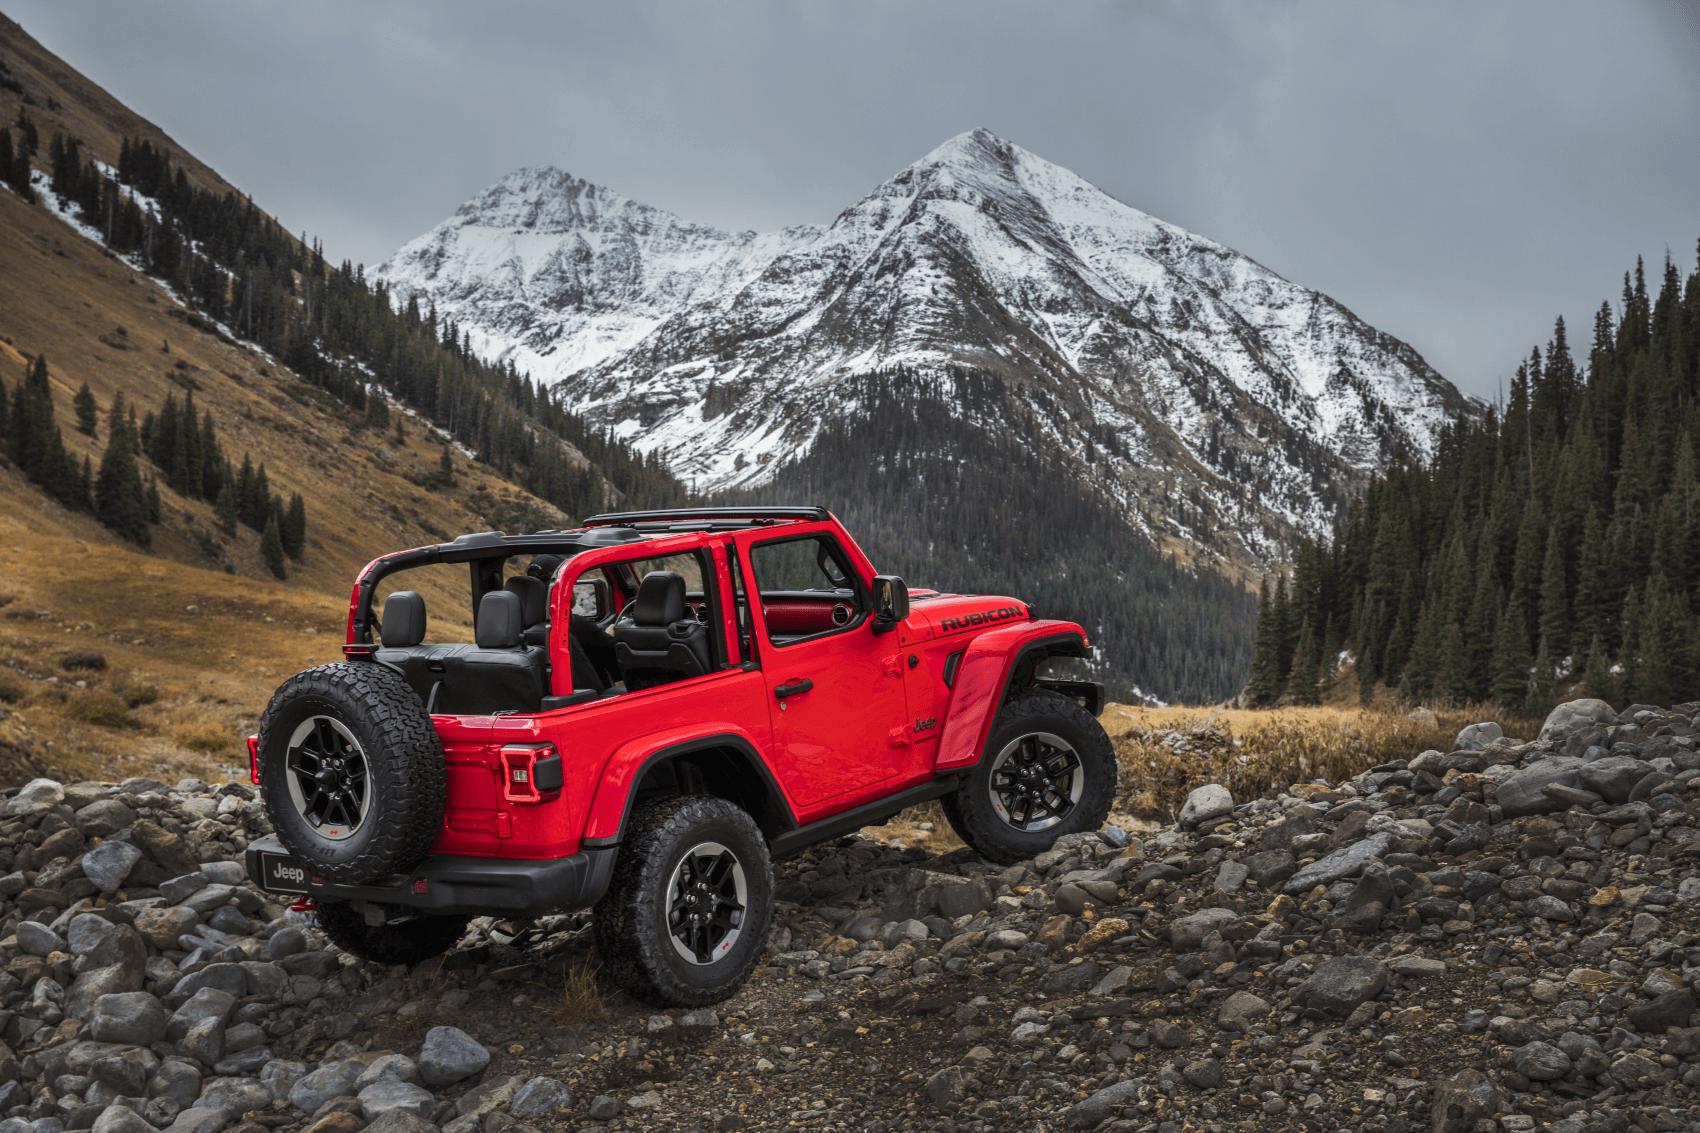 2021 Jeep Wrangler Red Distant Mountain C. Harper CDJR